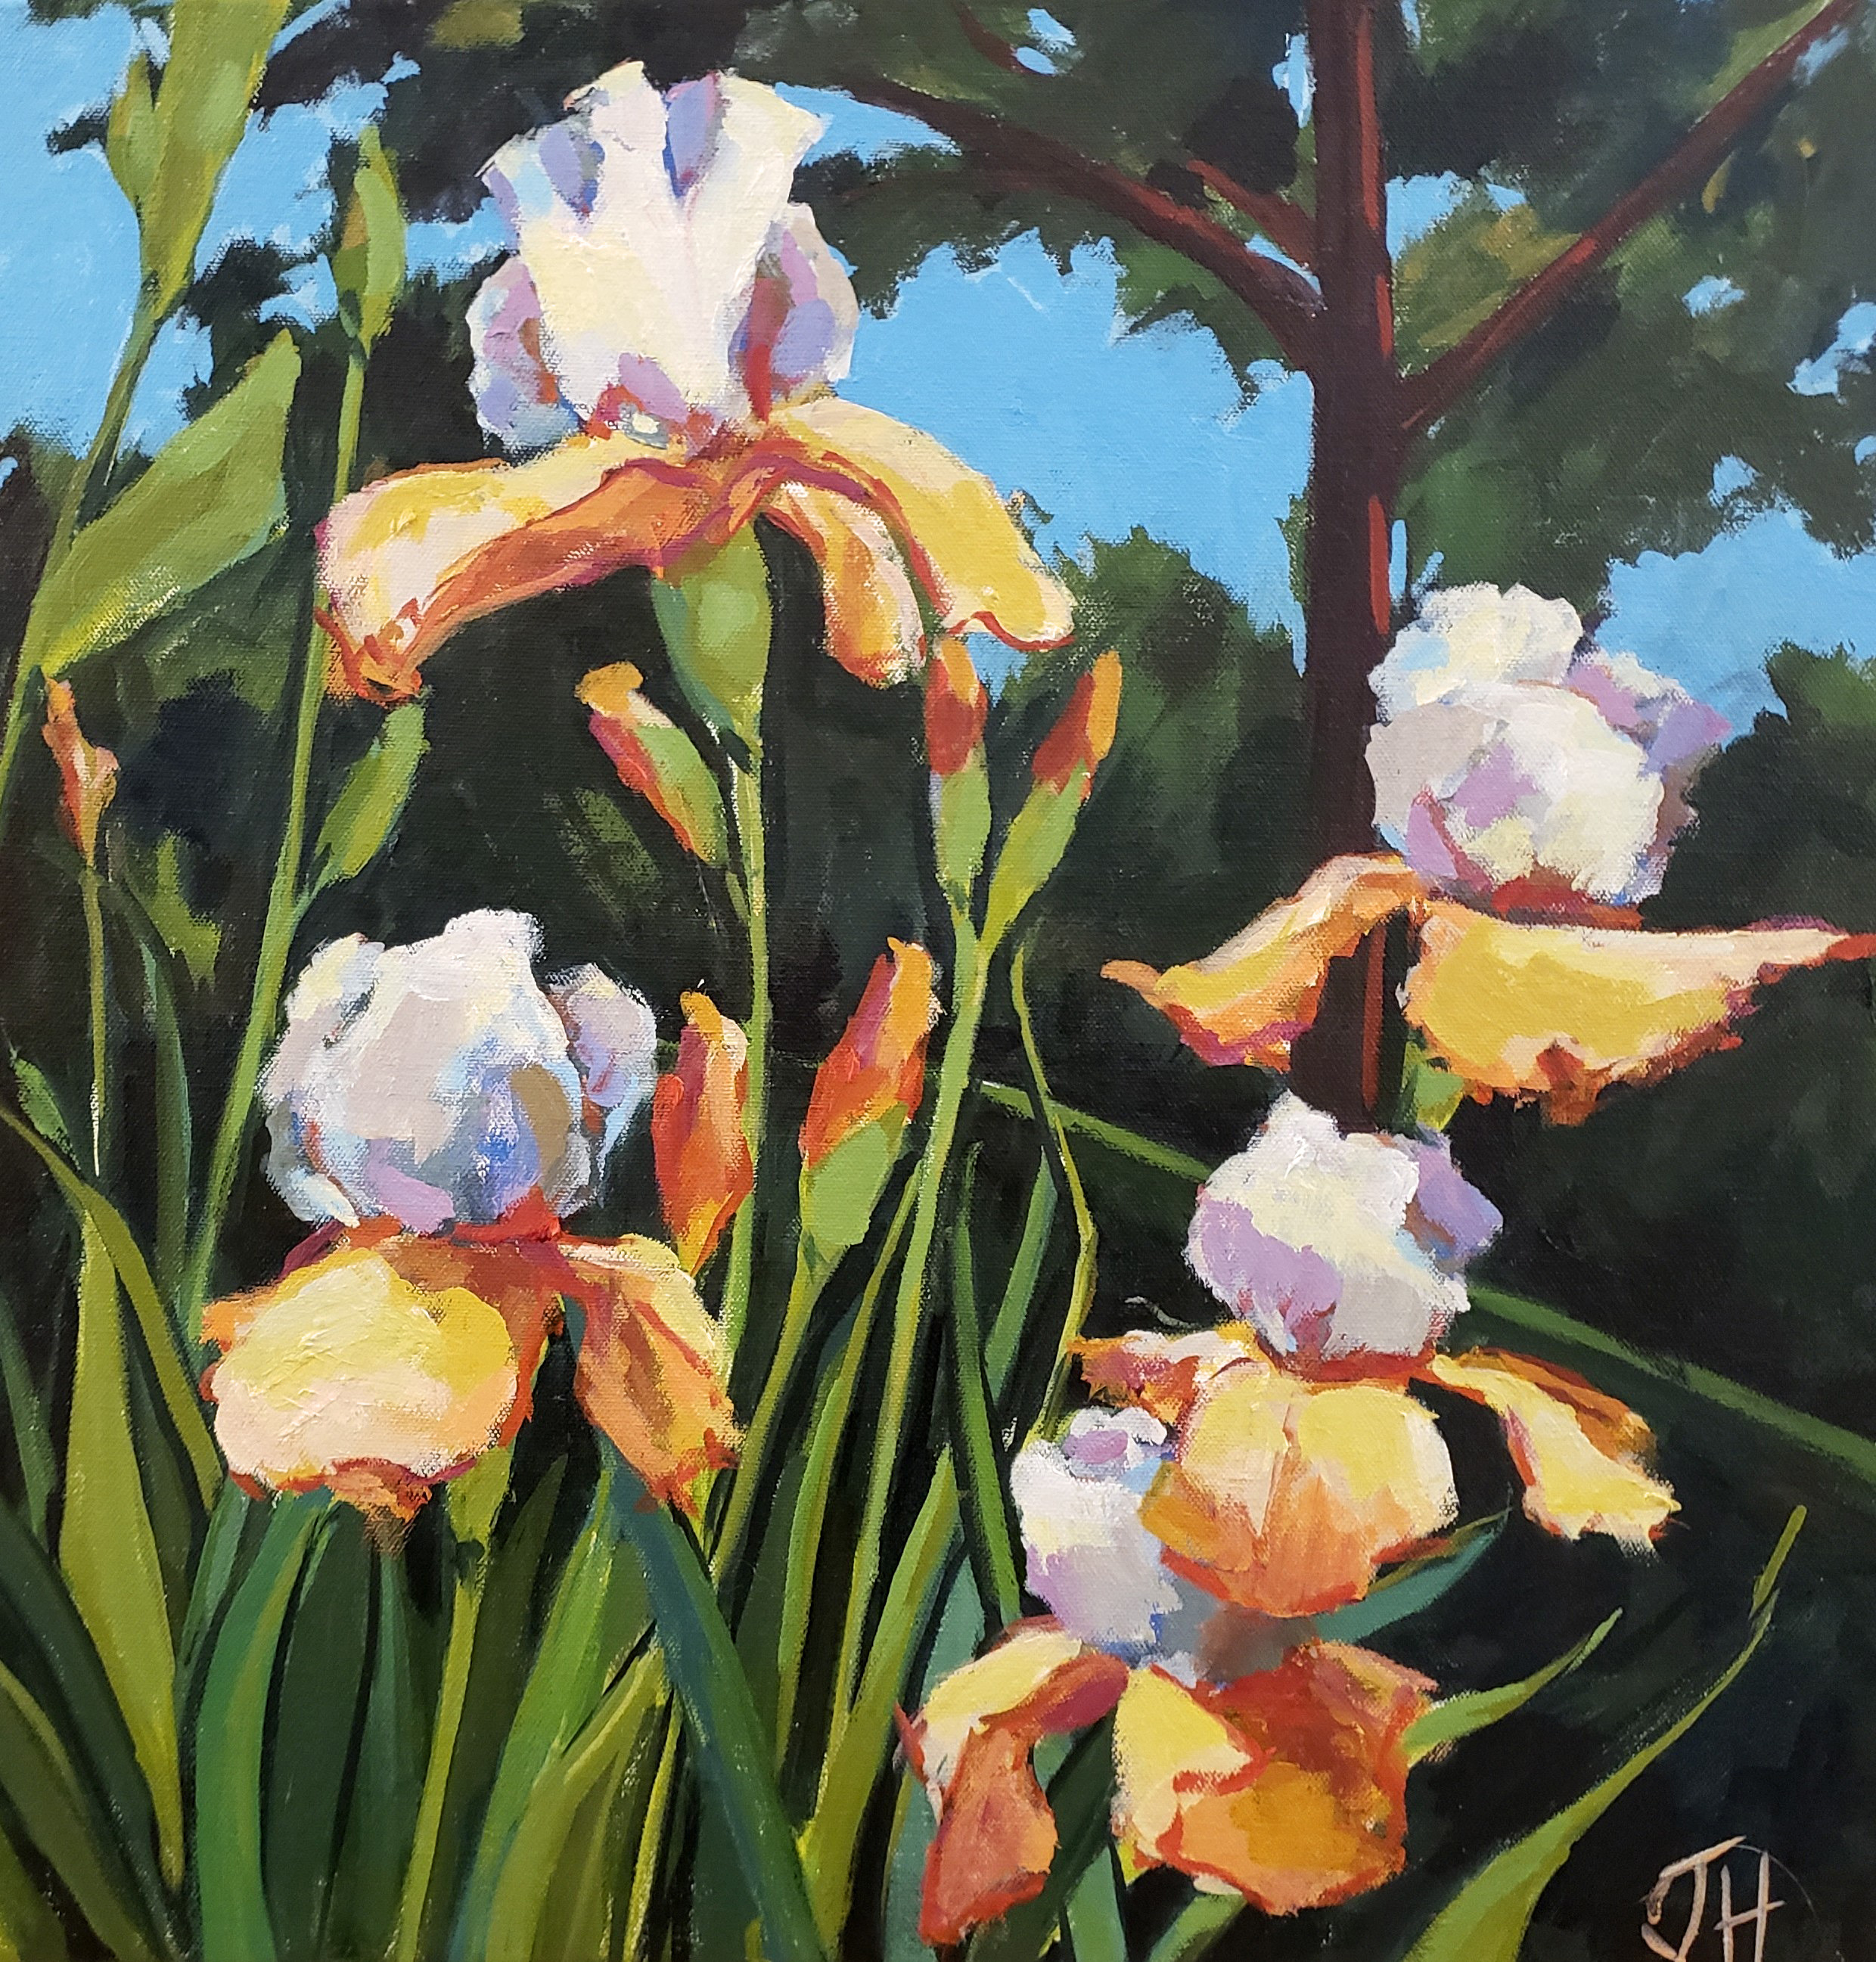 Jenn hallgren iris garden xii ezx5sd